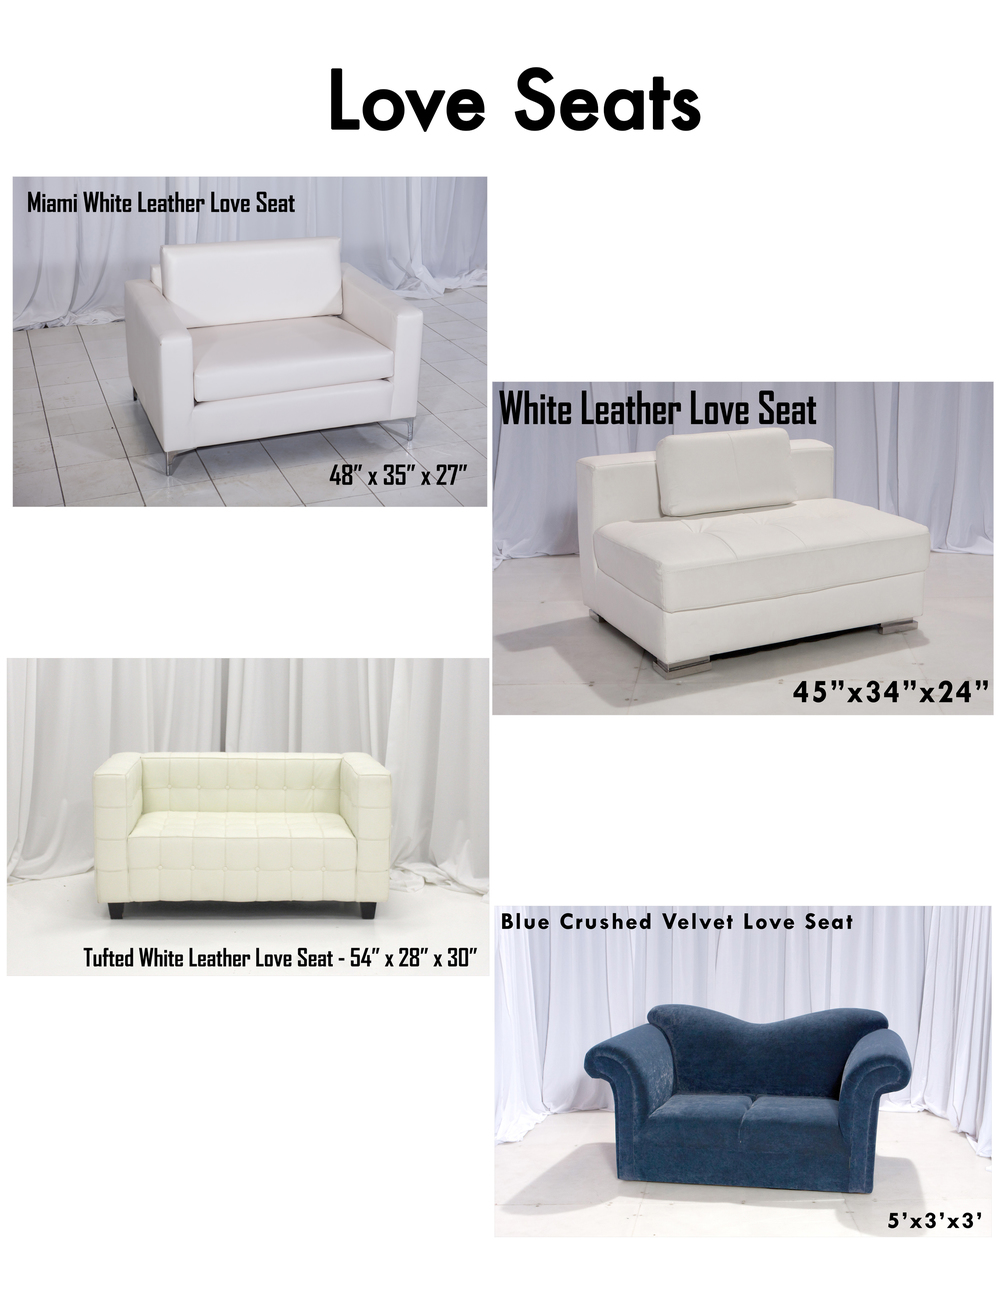 P52_Love Seats.jpg